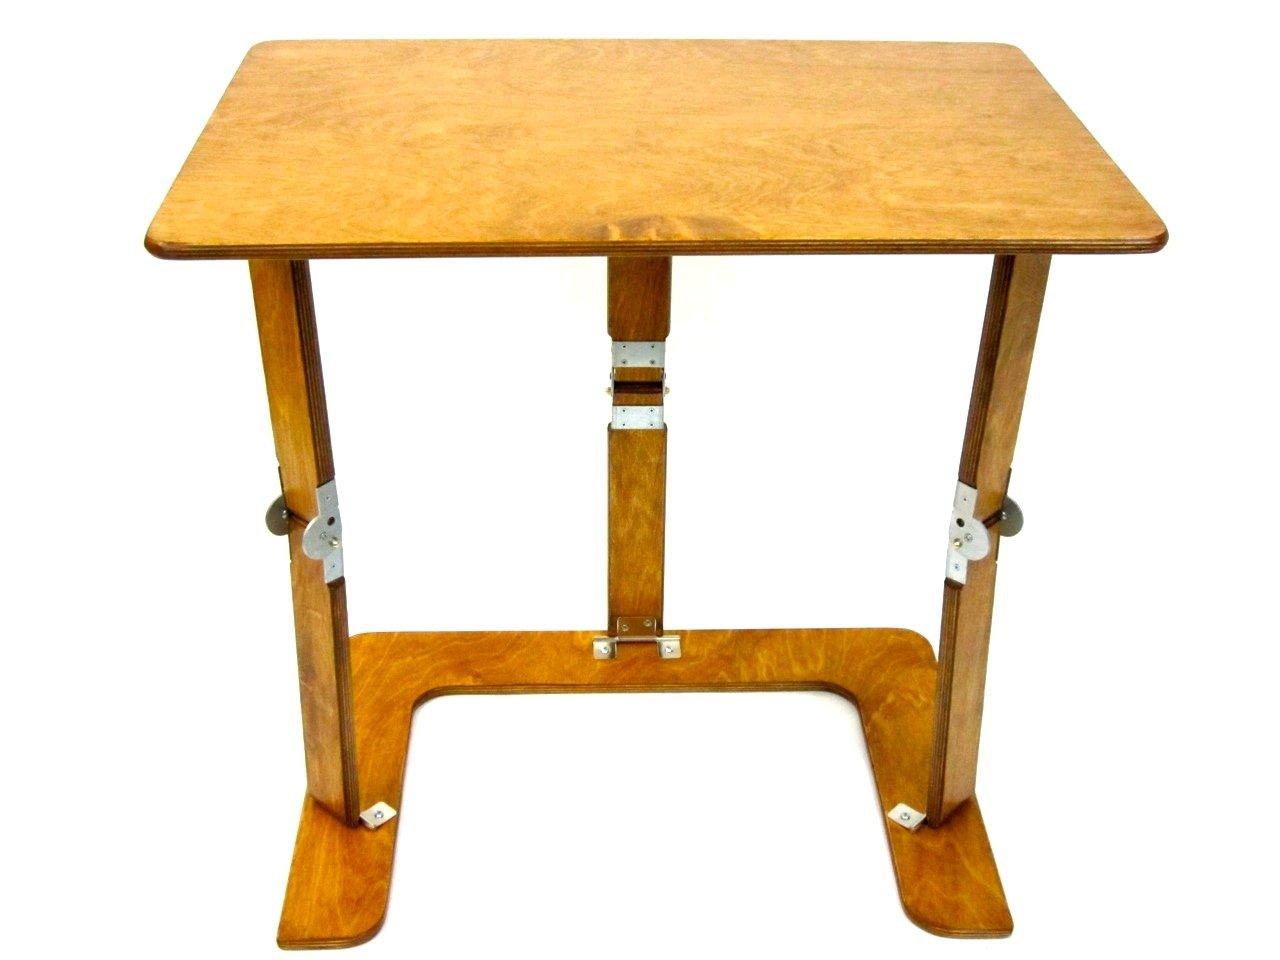 Spiderlegs Folding Couch Desk Tray Table, 25-Inch, Warm Oak